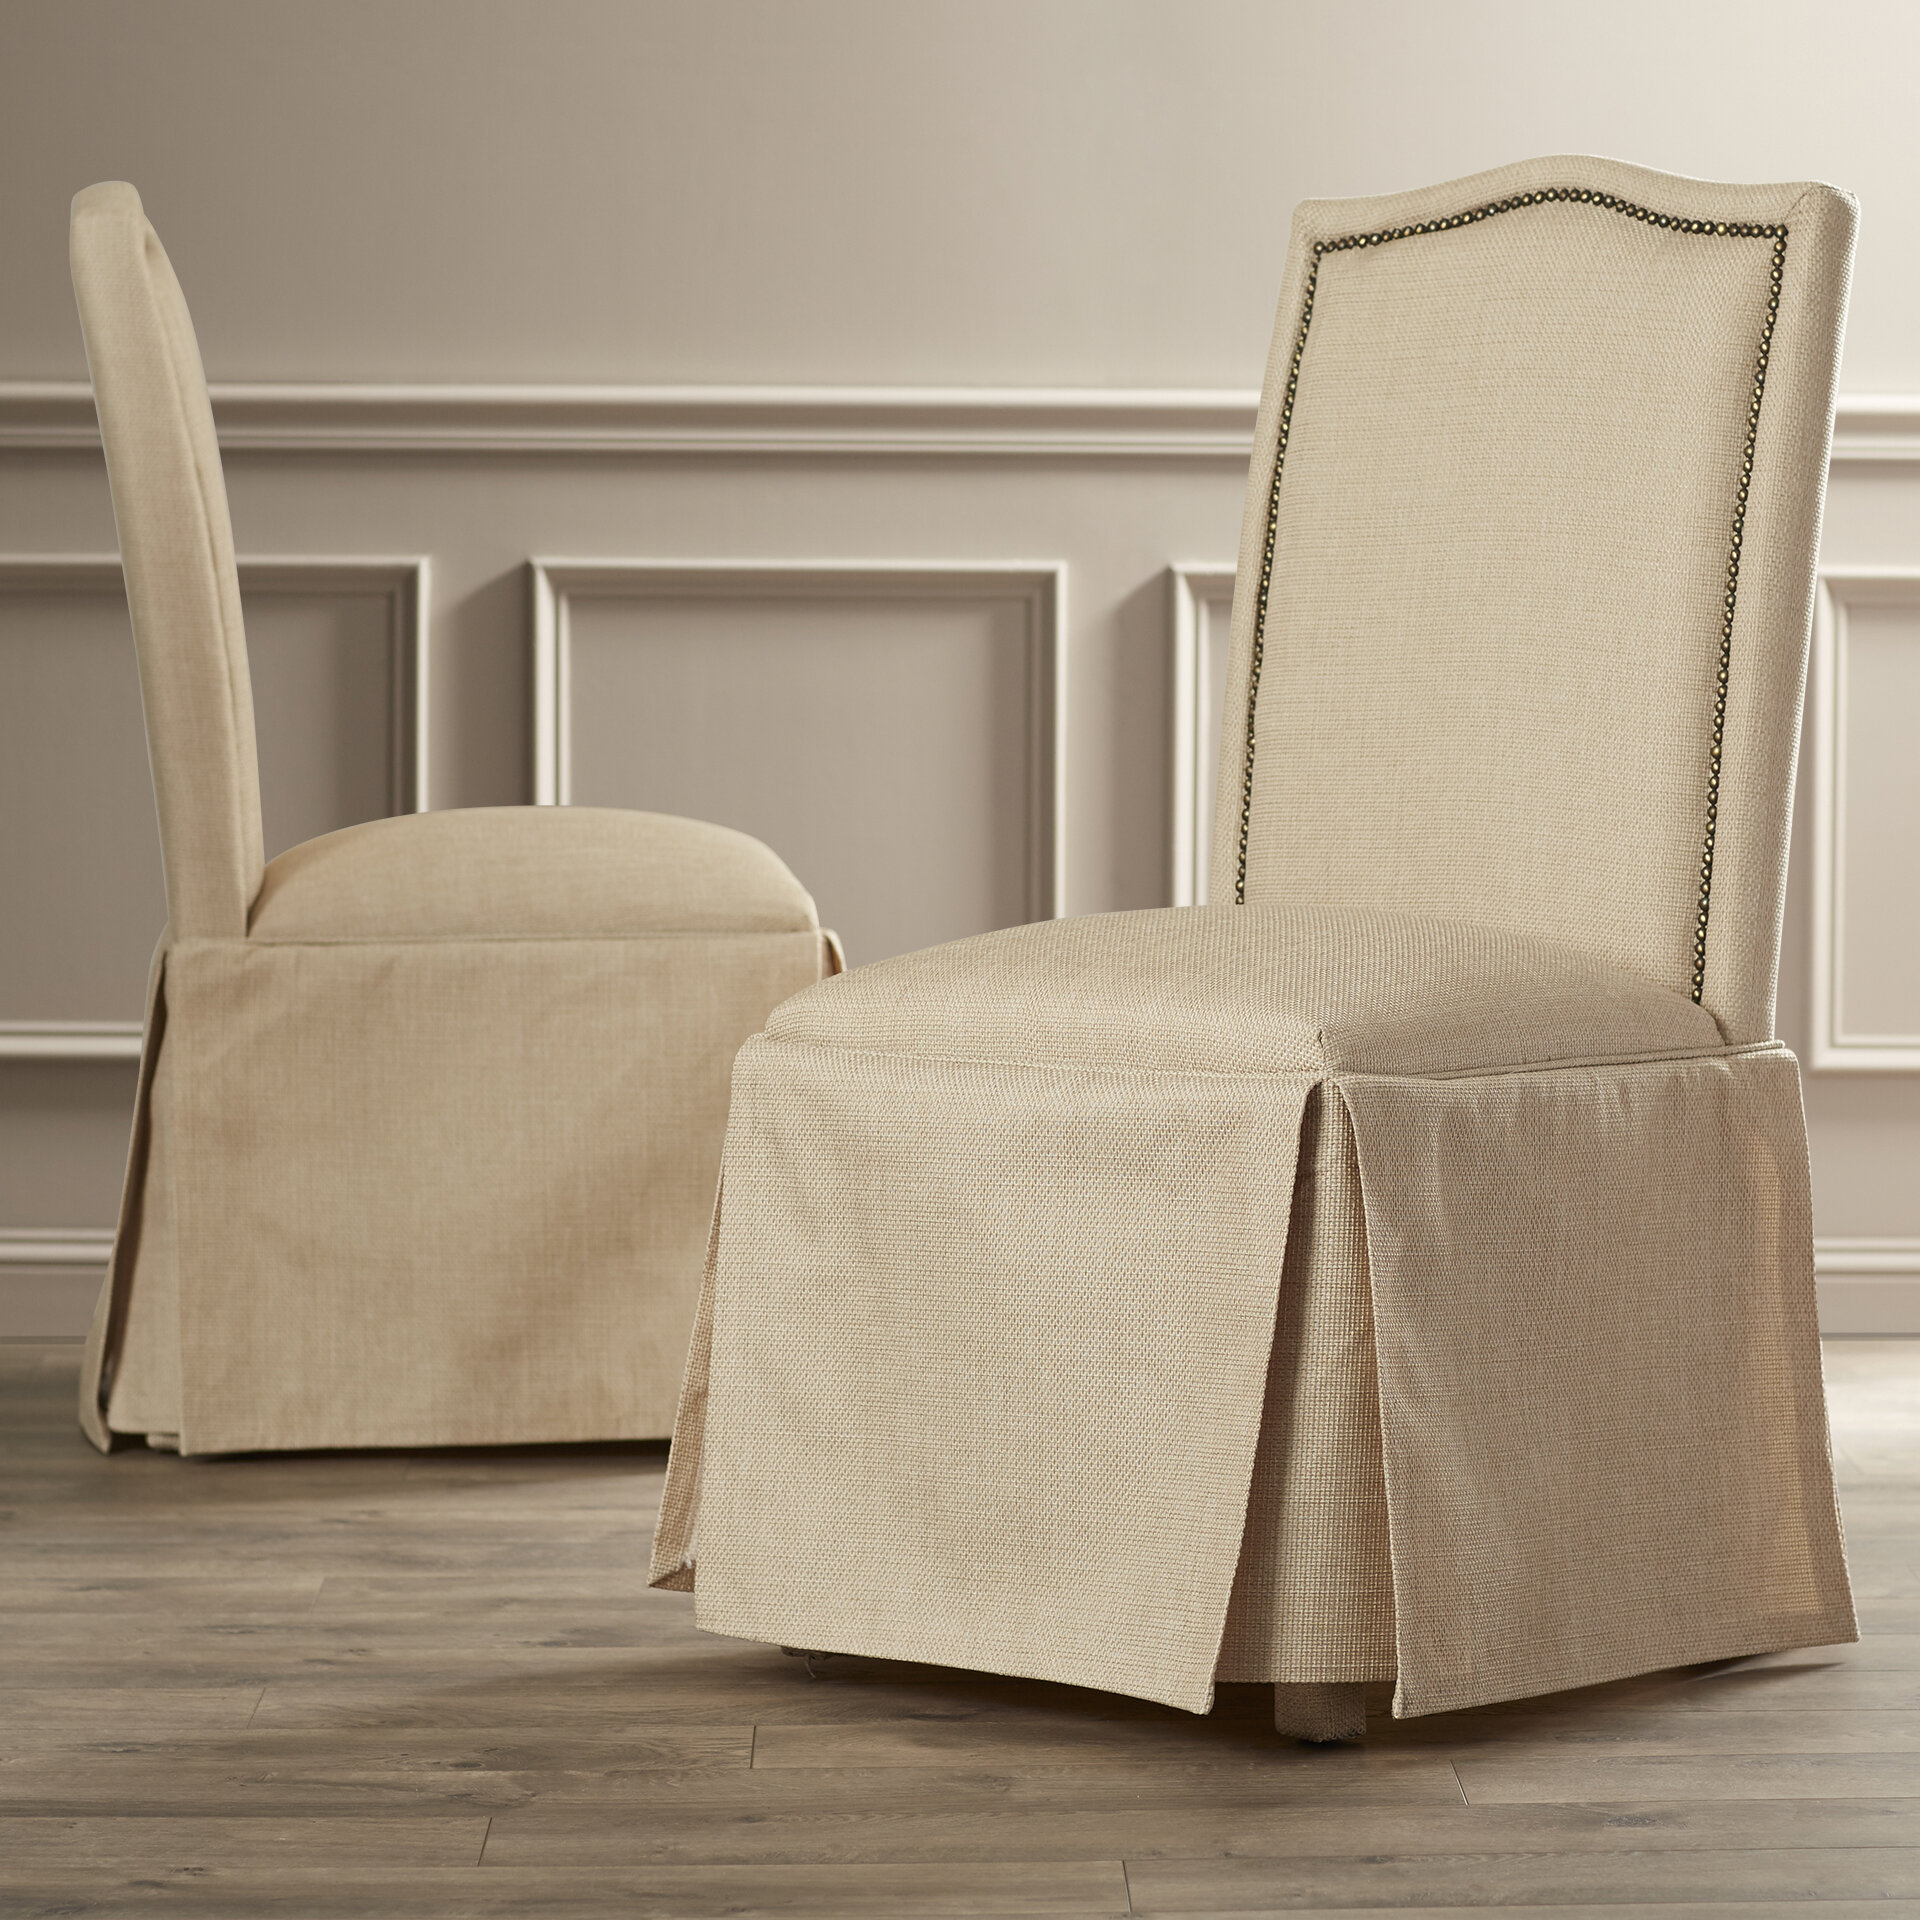 Alcott Hill Alison Skirted Parson Chair U0026 Reviews | Wayfair